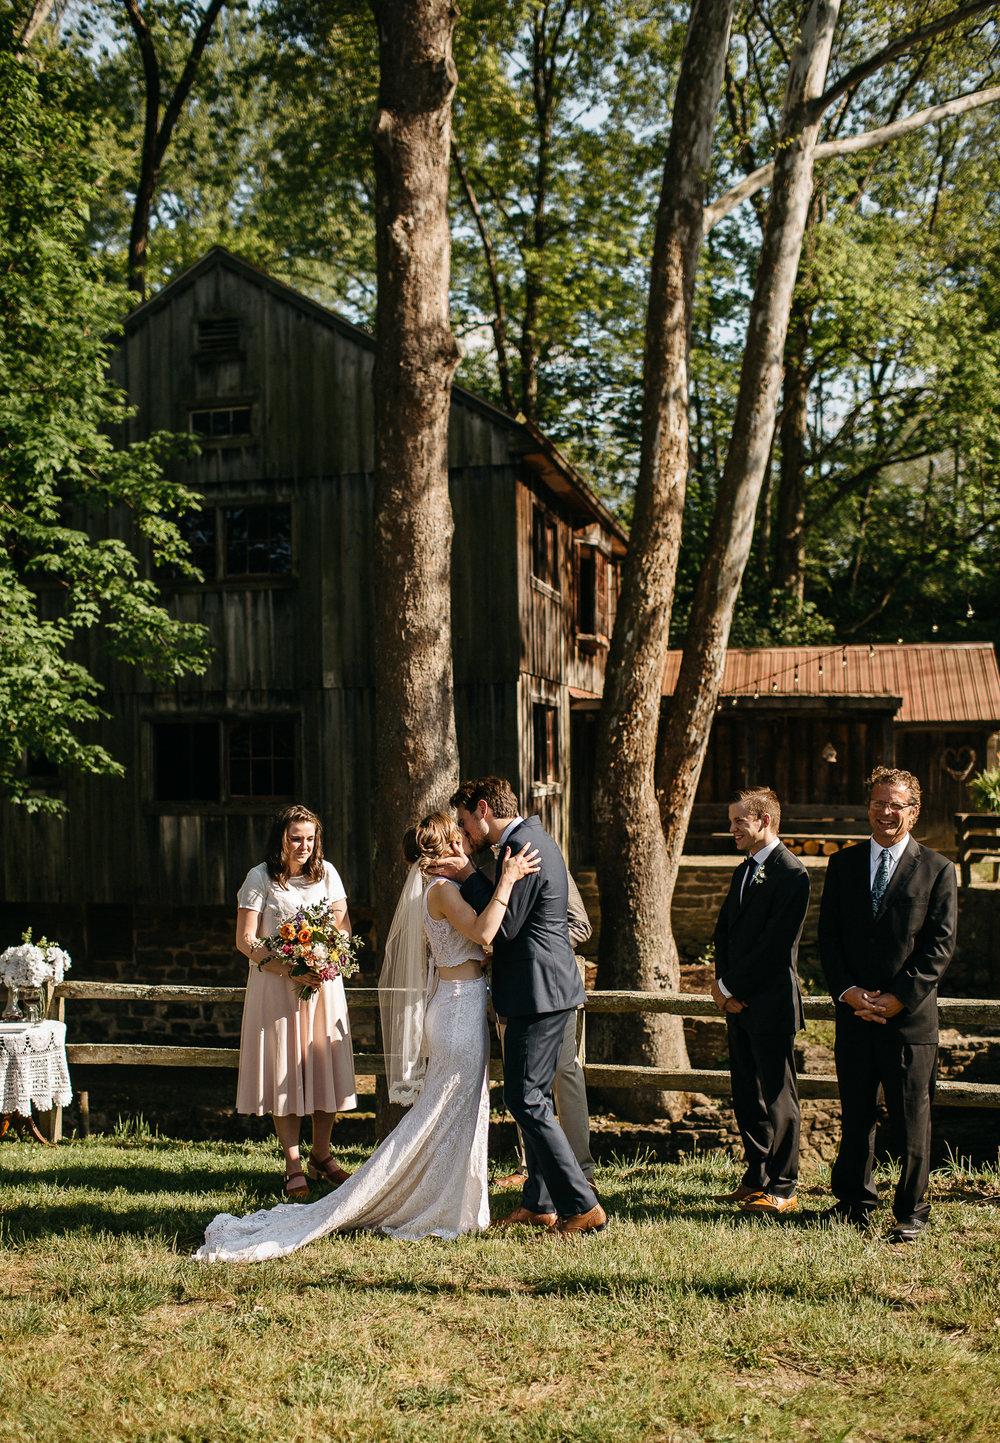 eastlyn bright intimate ohio backyard bohemian forest wedding photographer -61.jpg